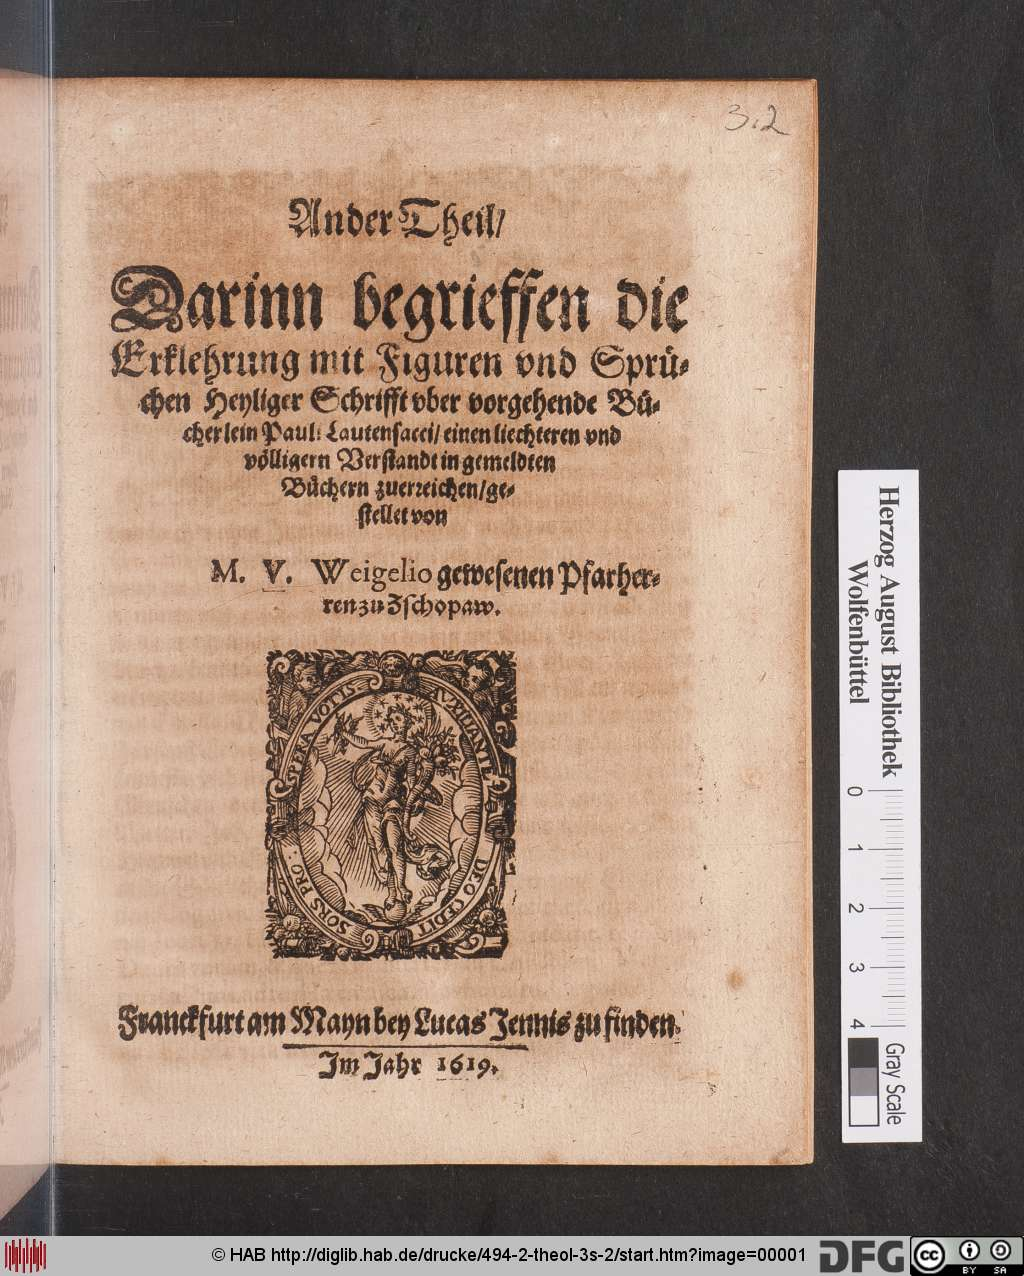 http://diglib.hab.de/drucke/494-2-theol-3s-2/00001.jpg